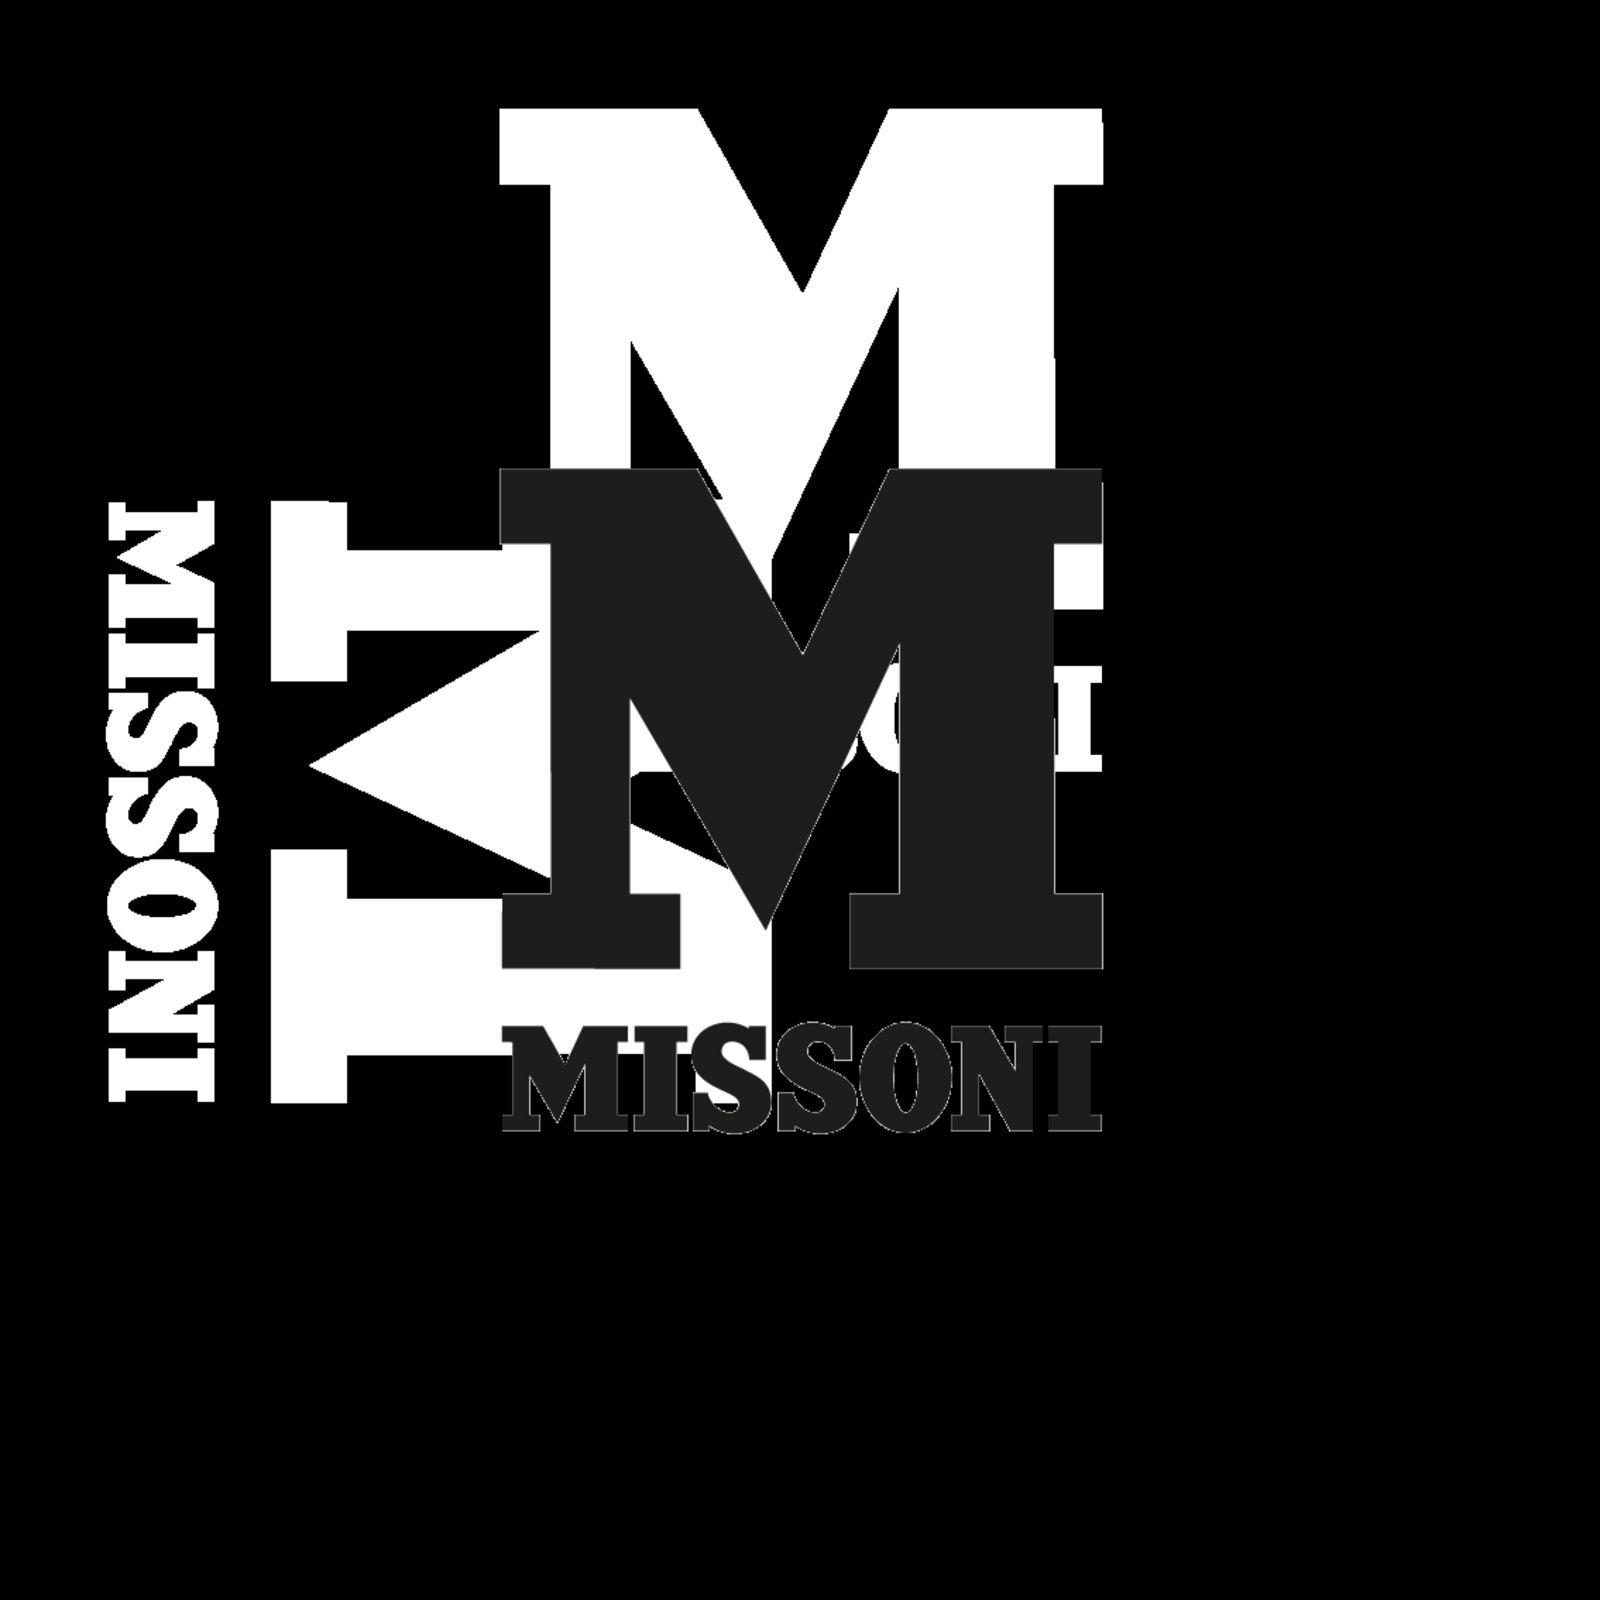 M MISSONI (Изображение 1)